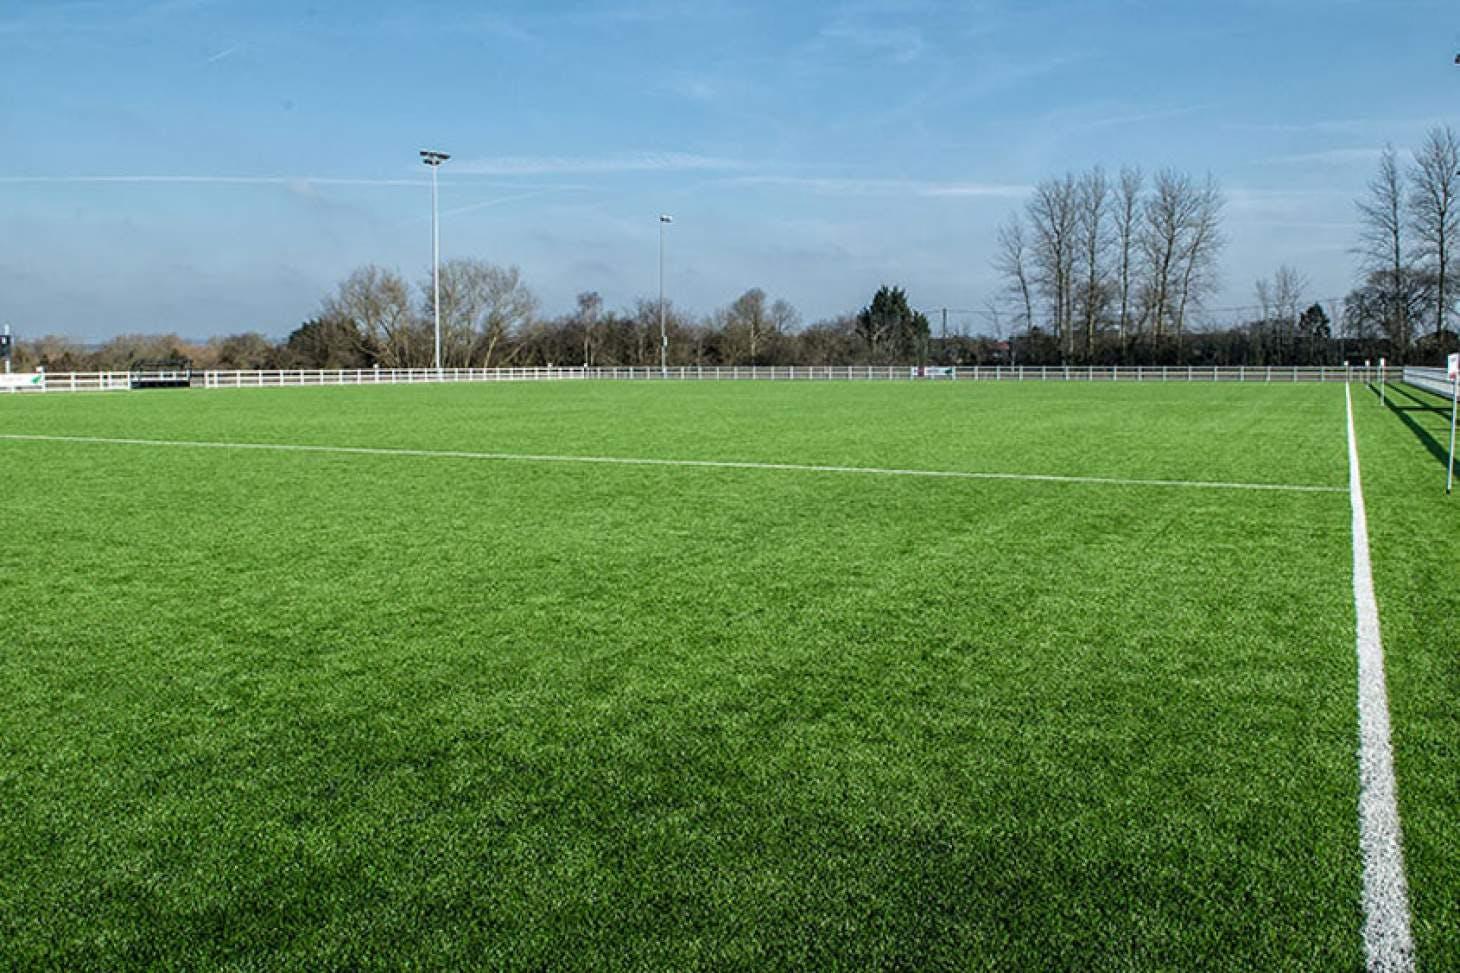 PlayFootball Ivybridge 5 a side | 3G Astroturf football pitch